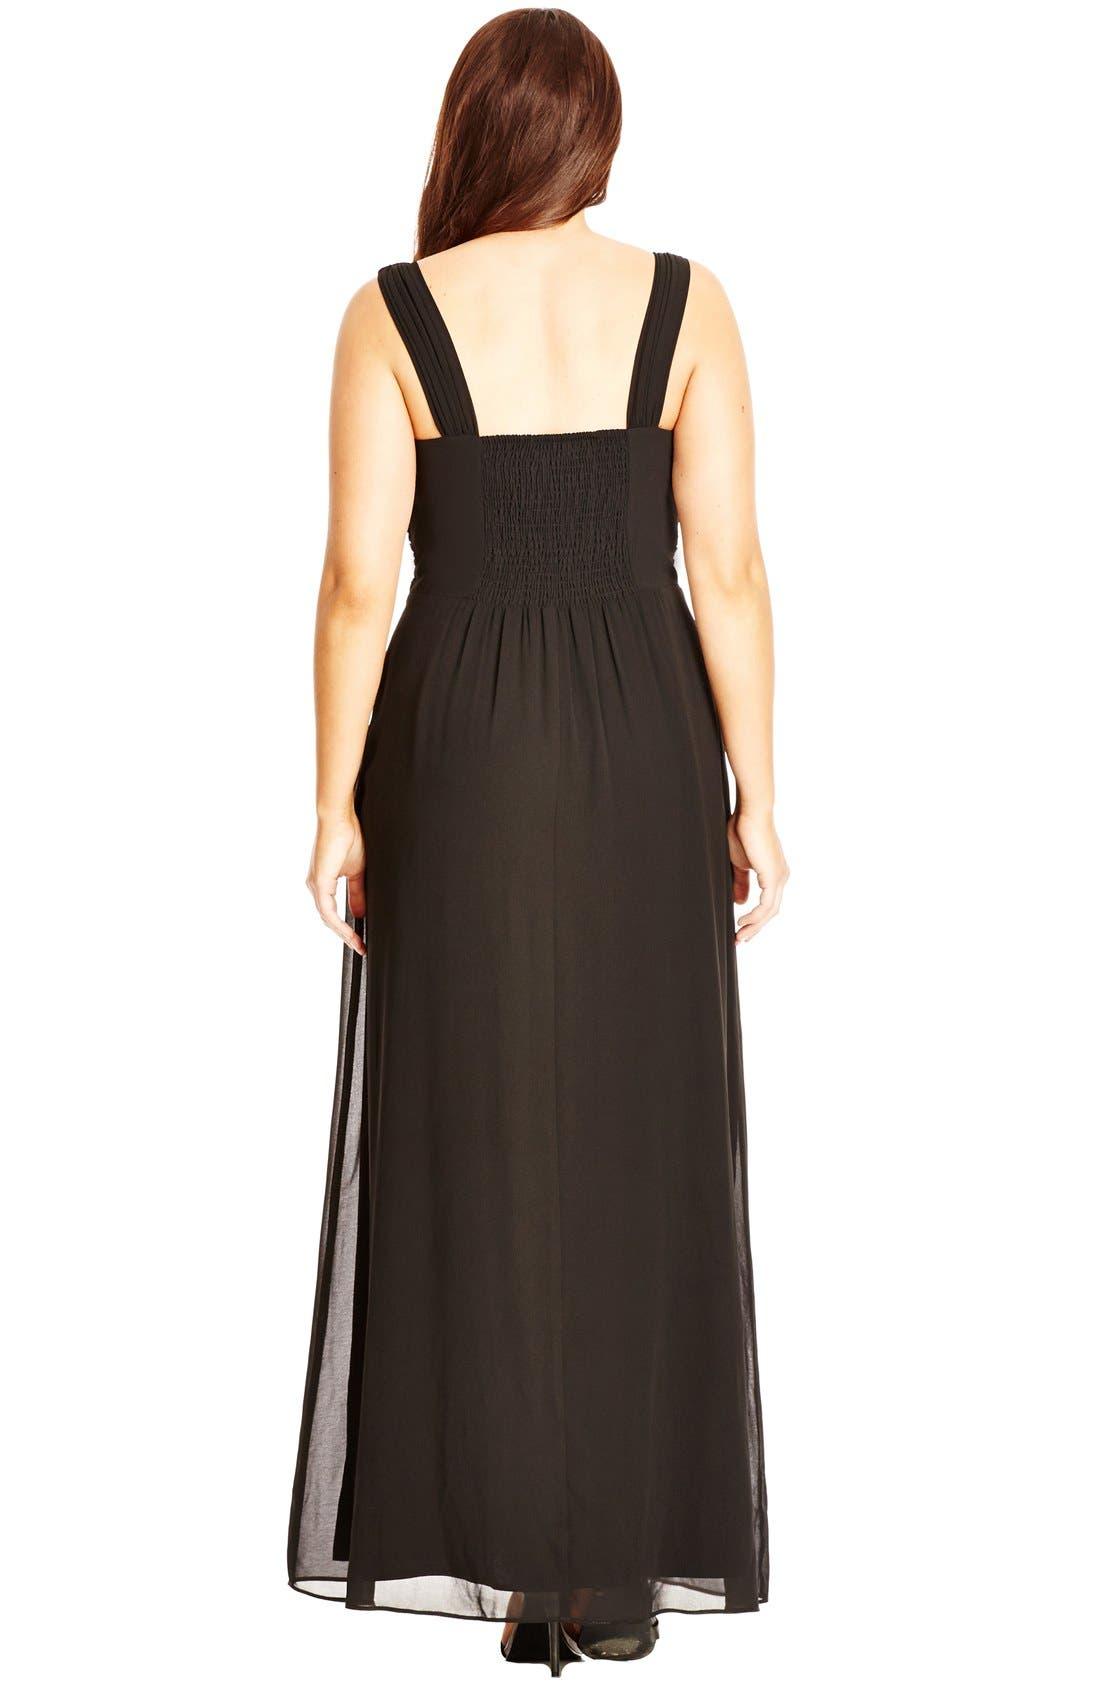 'Elegant Sparkle' Embellished Maxi Dress,                             Alternate thumbnail 2, color,                             001